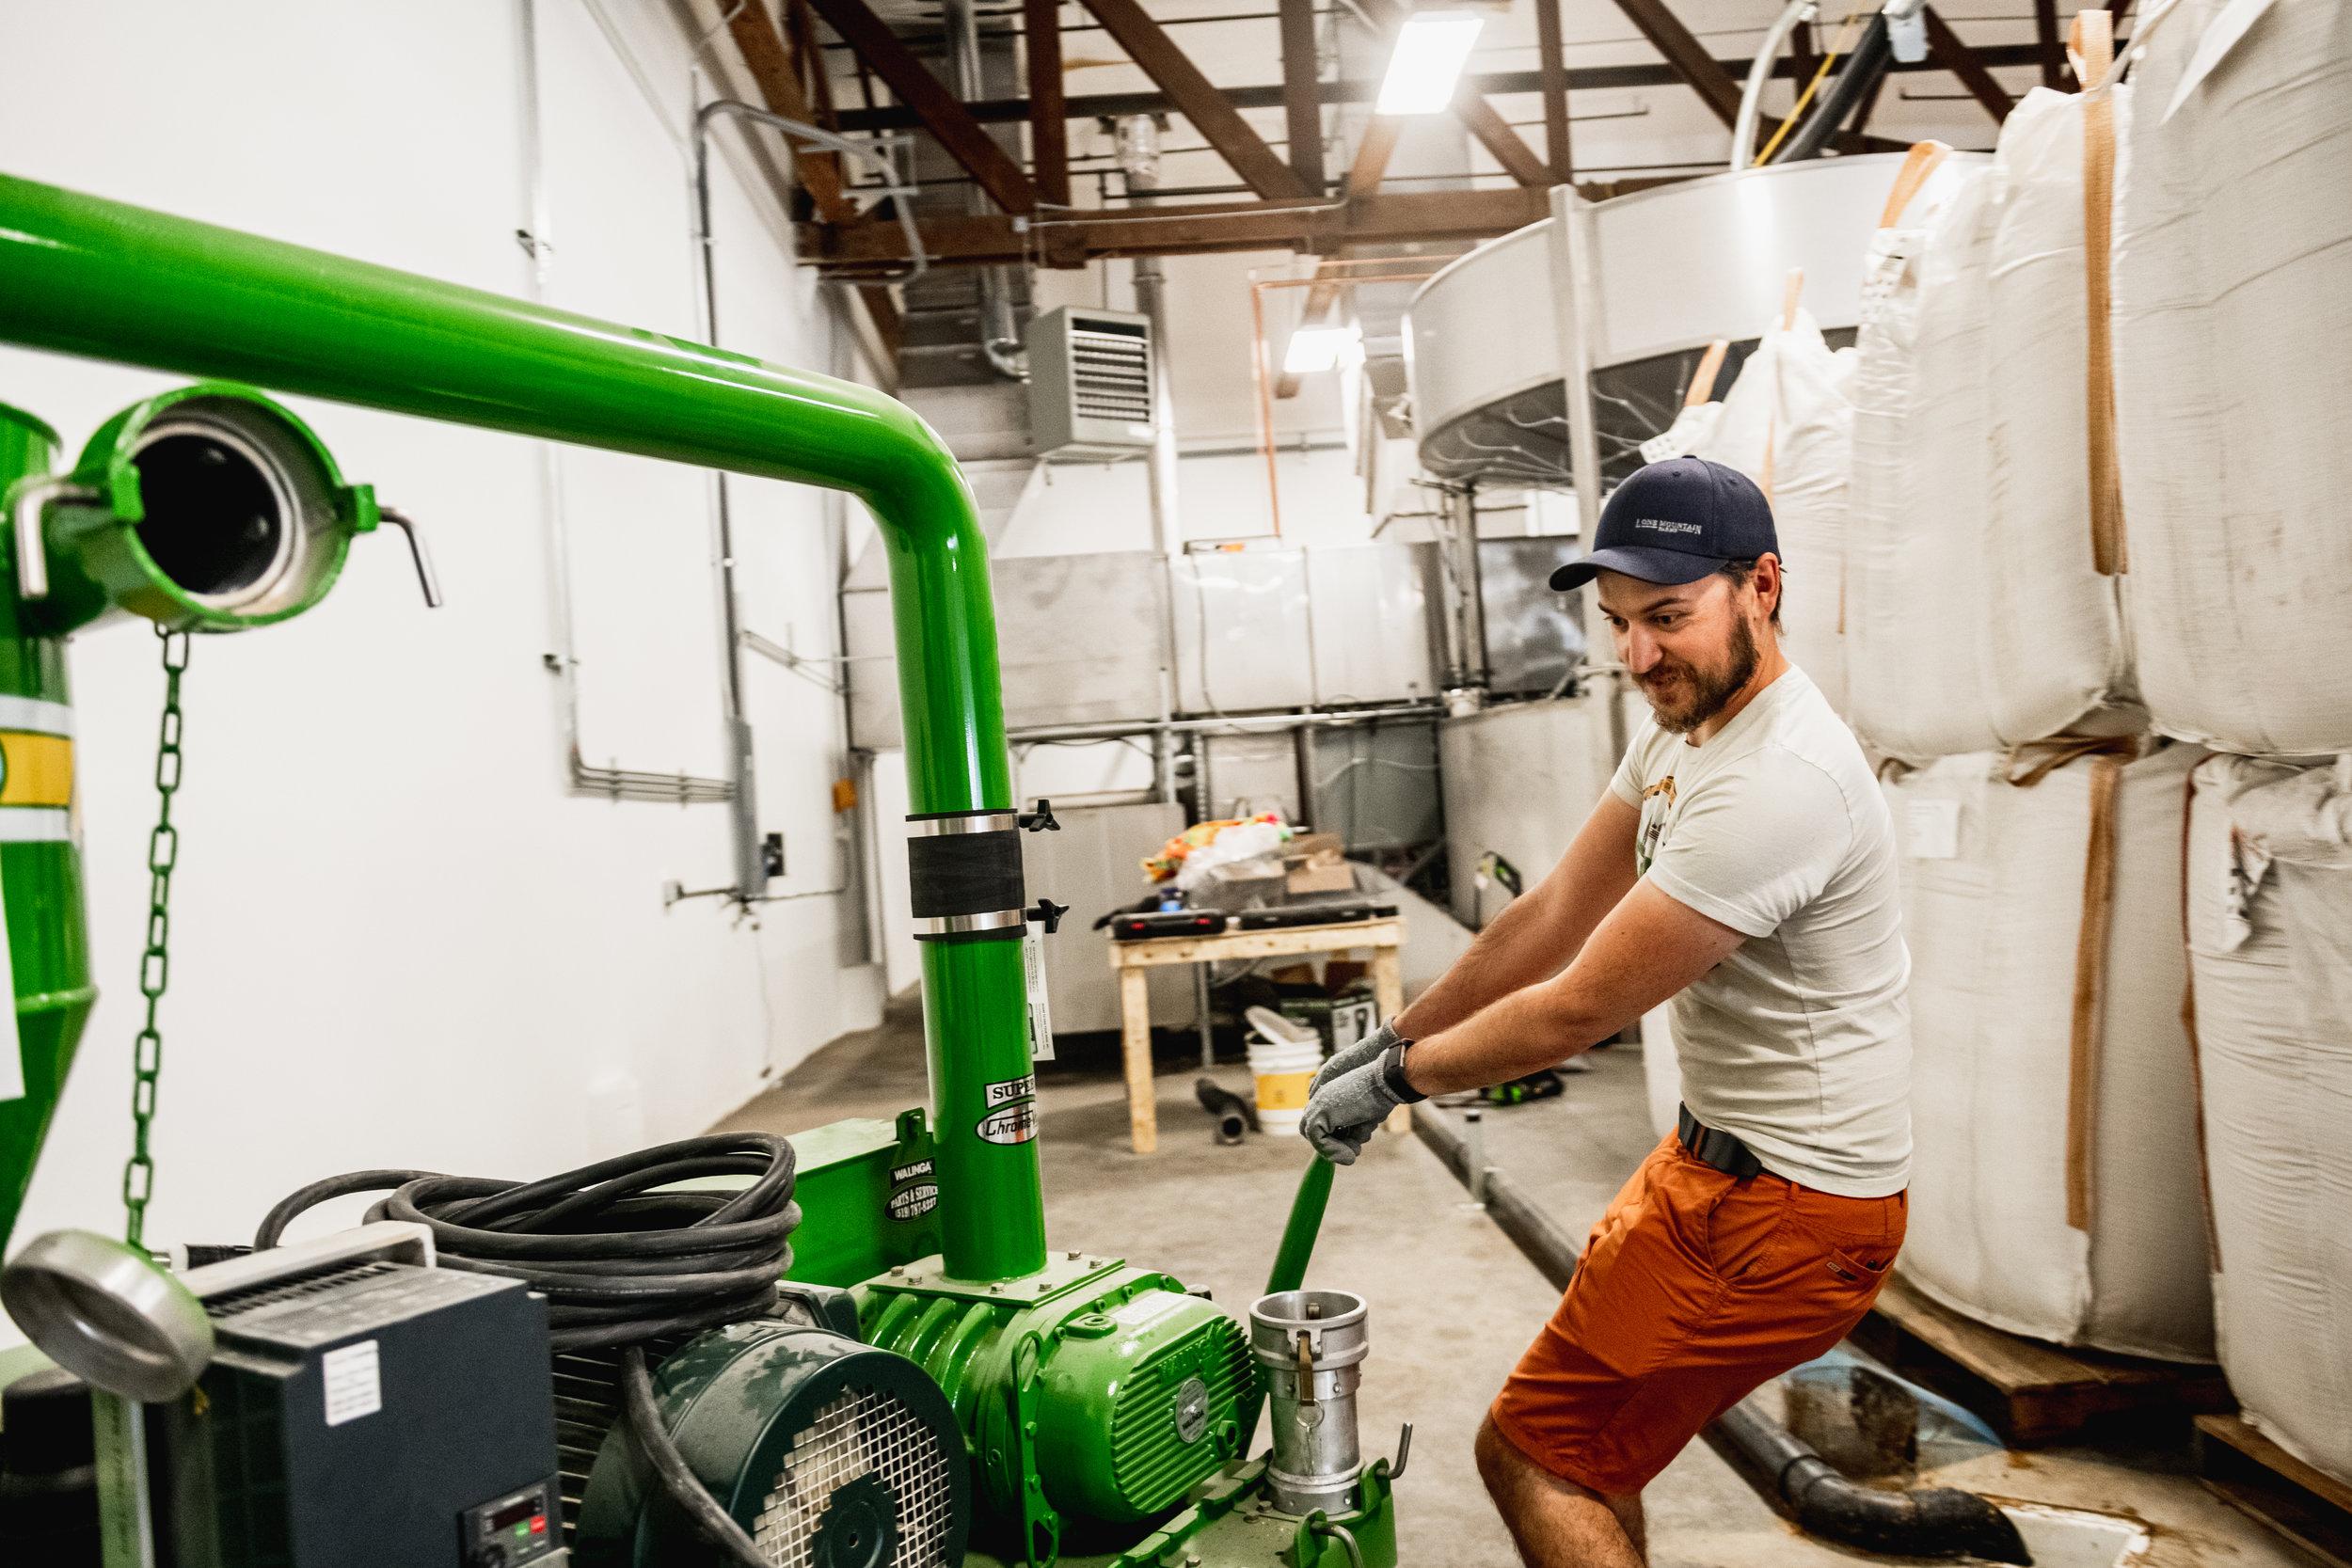 Joel Williamson working in the Spokane Valley malt house